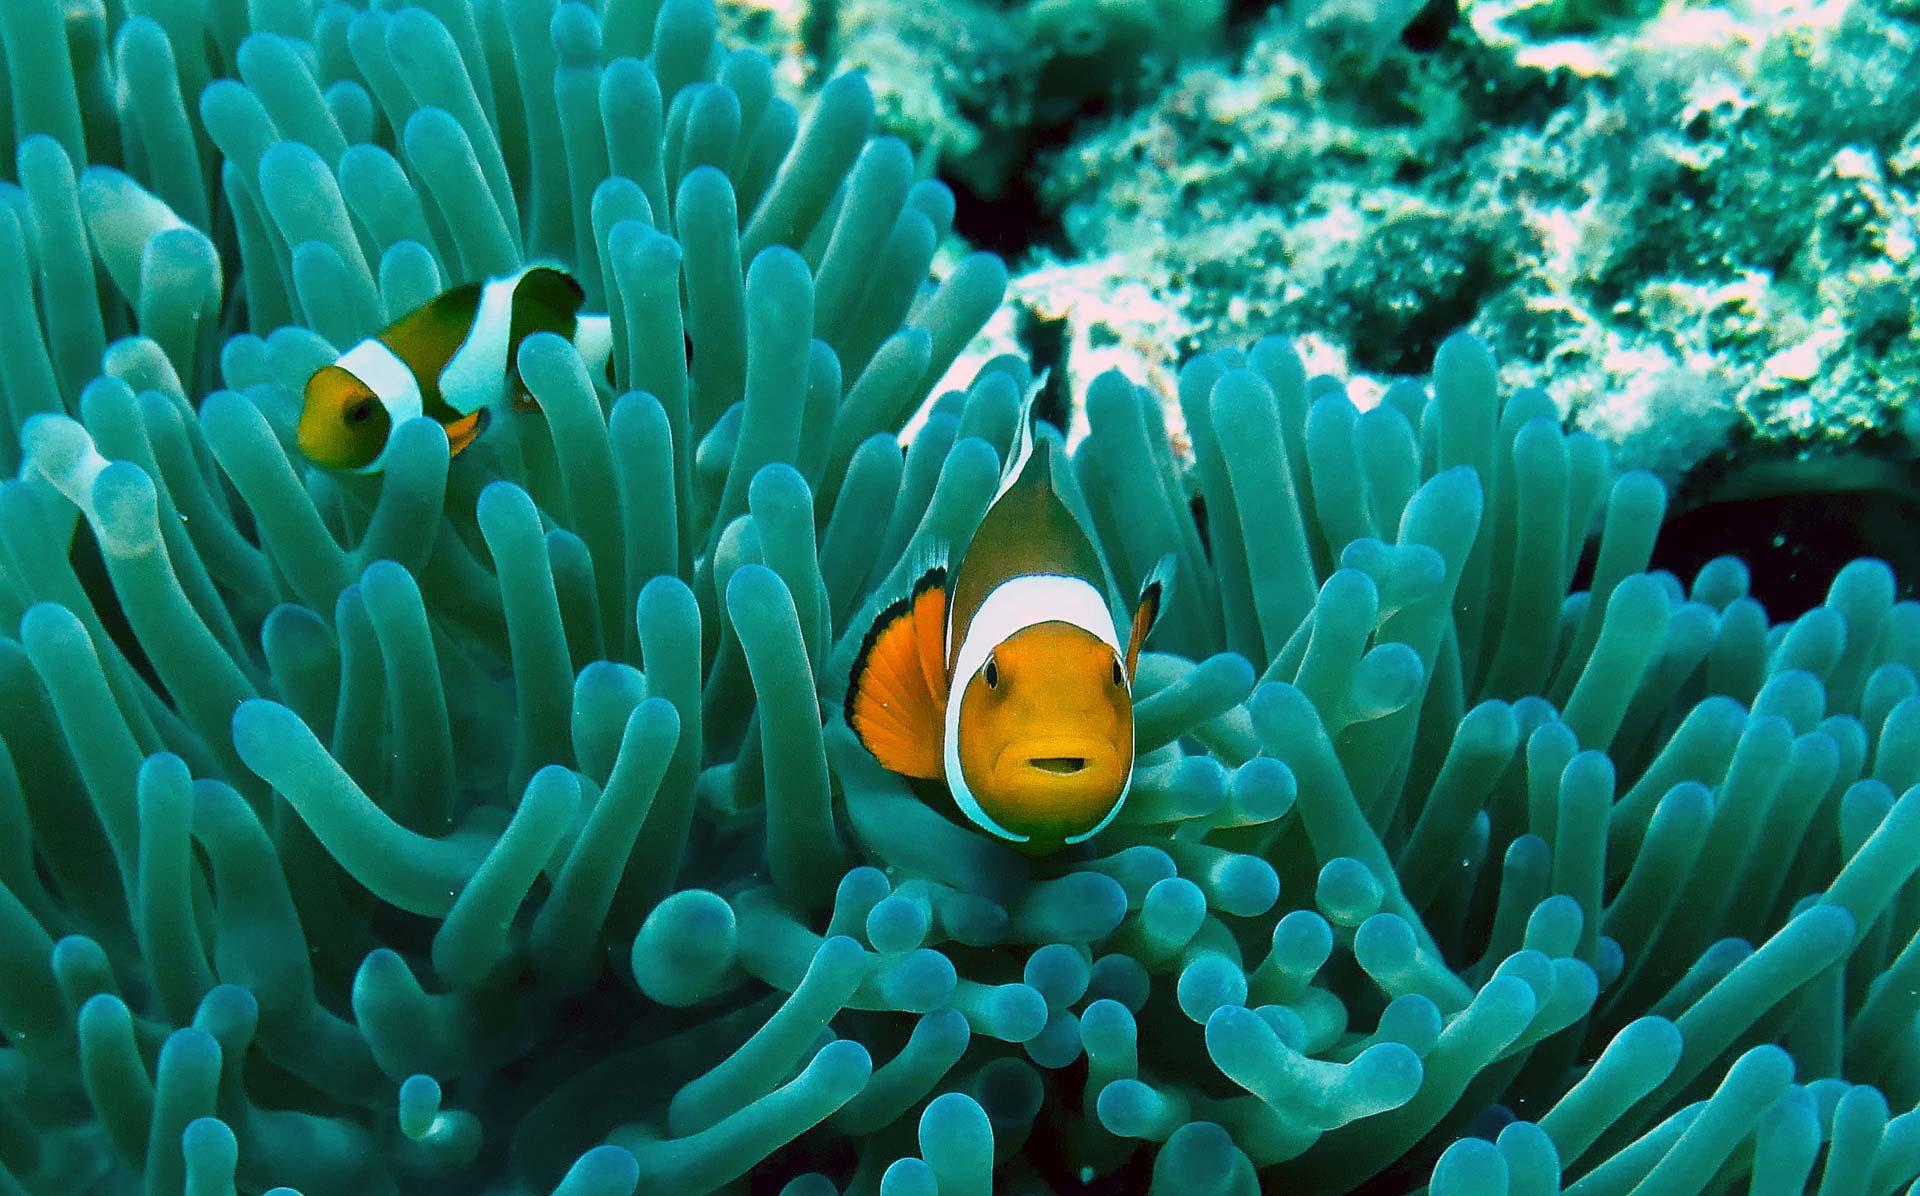 Poisson clown de l'aquarium de Monaco